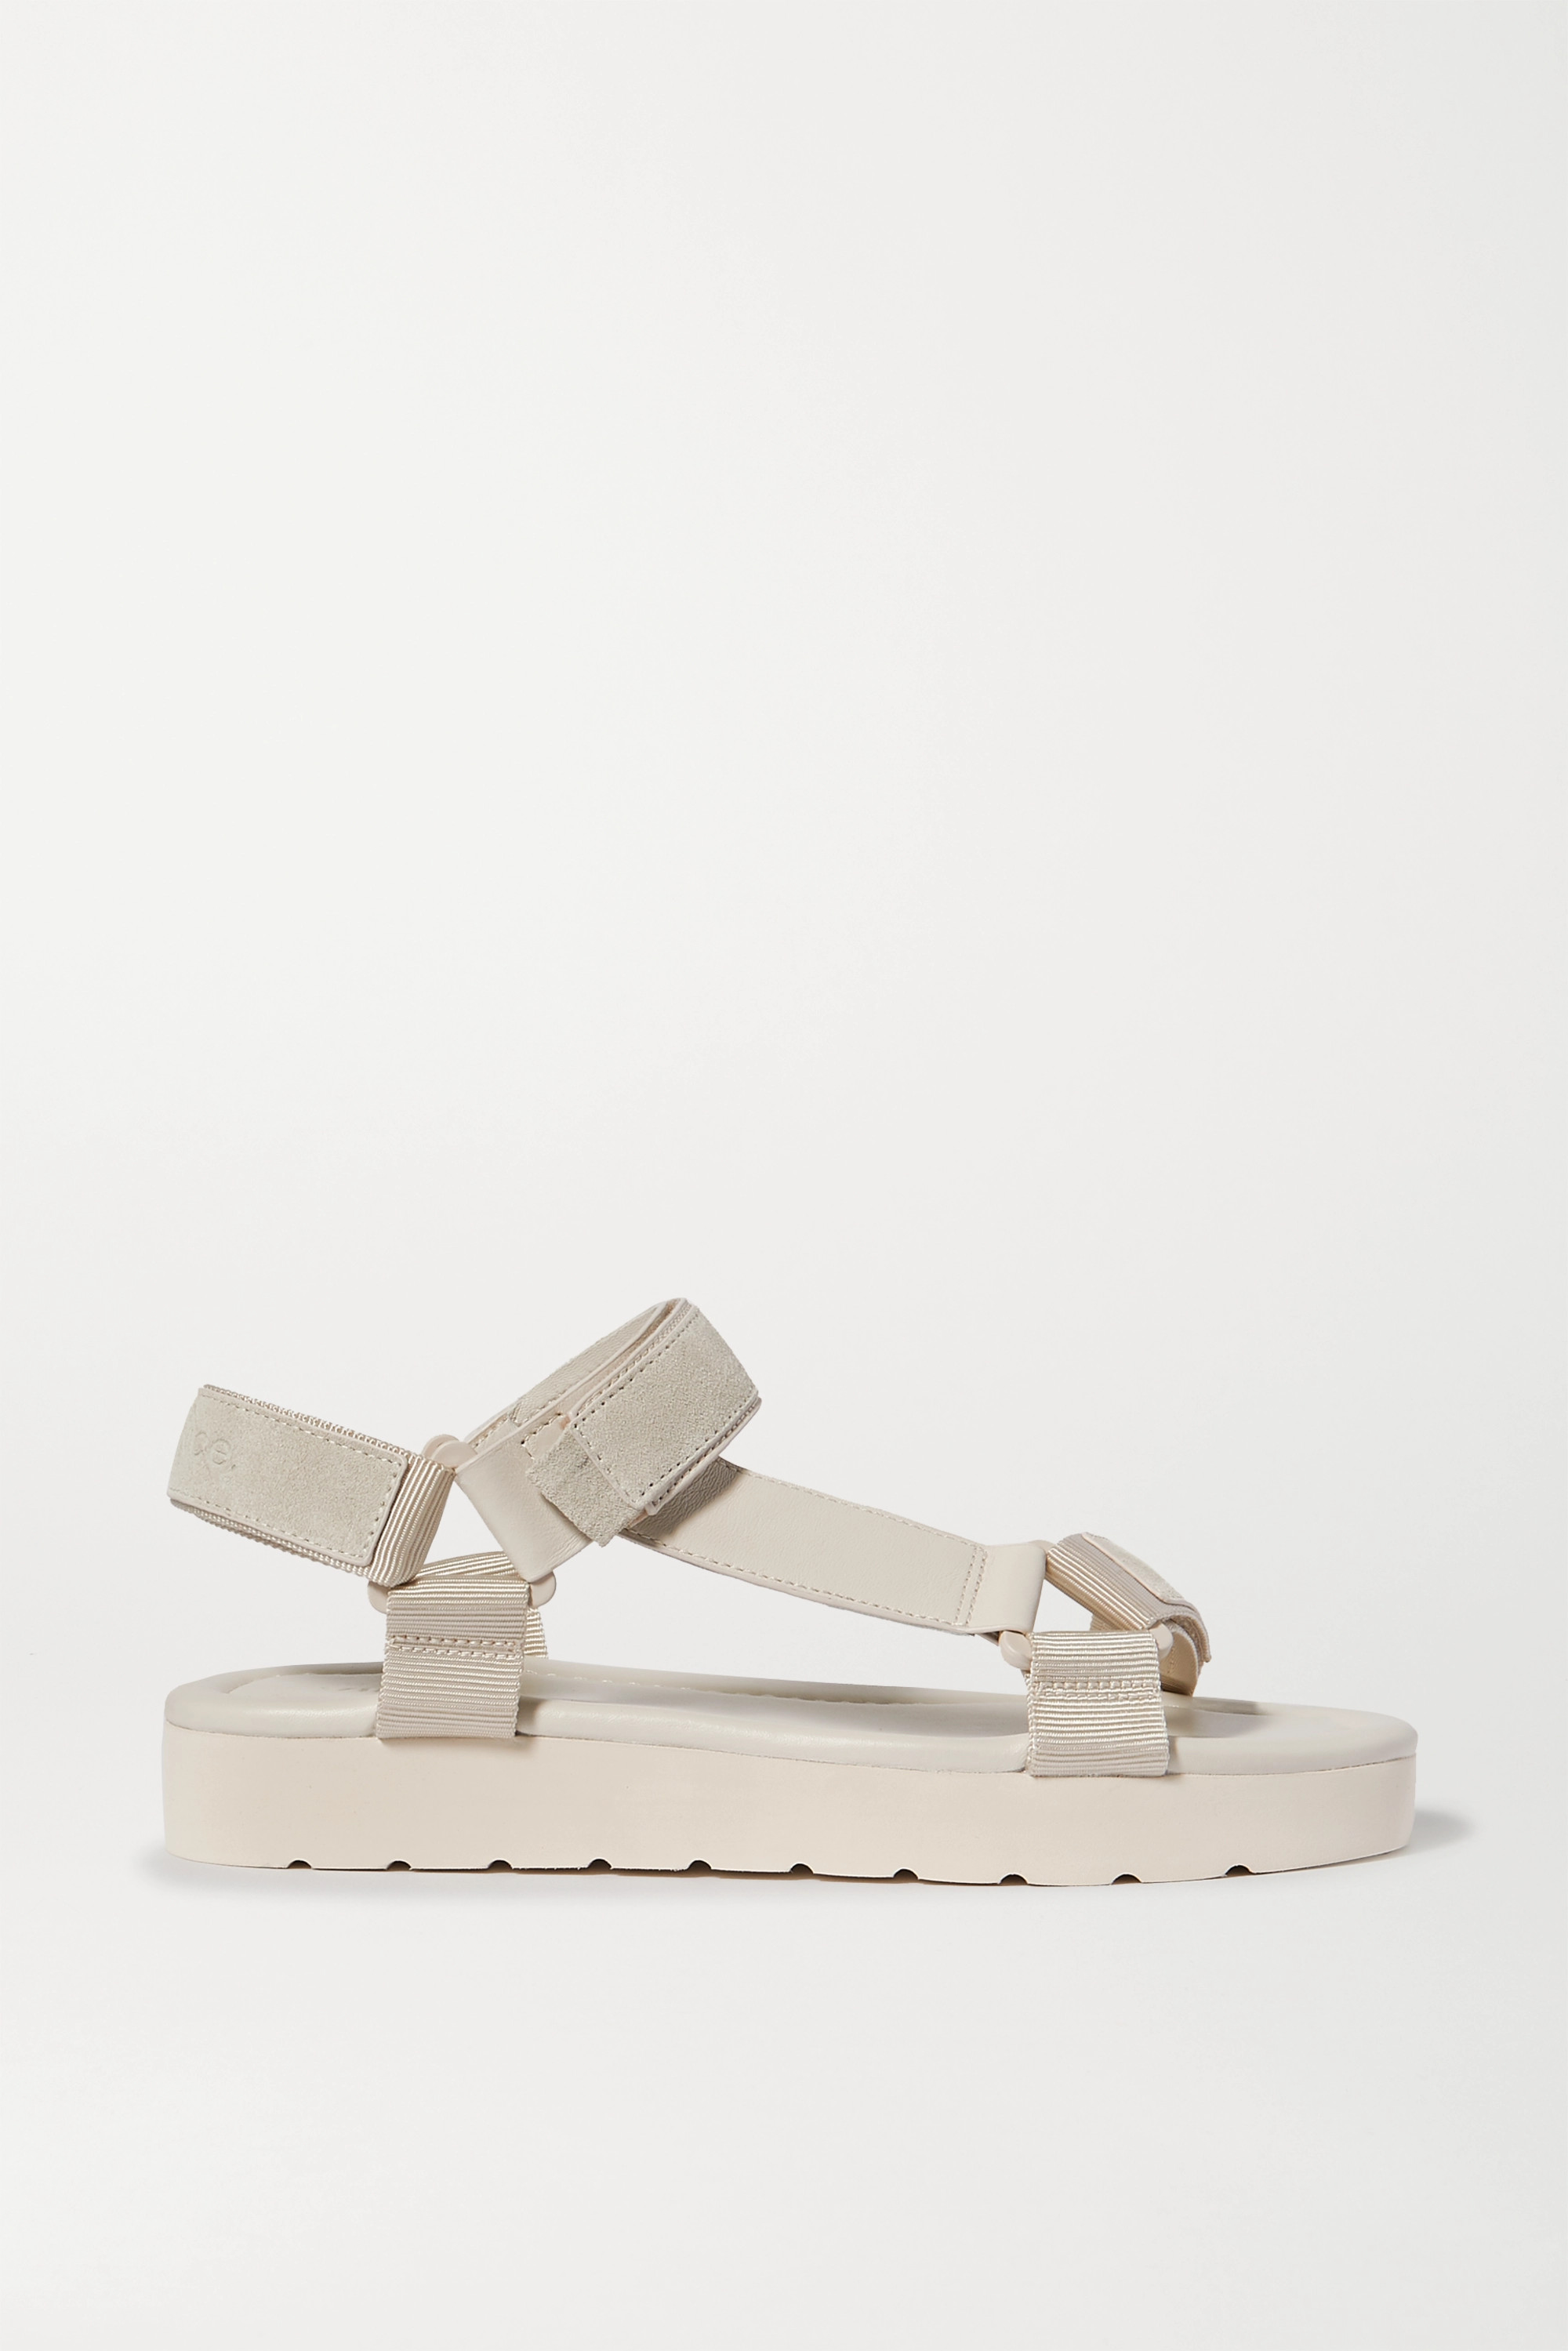 Vince Carver leather, suede and canvas platform sandals